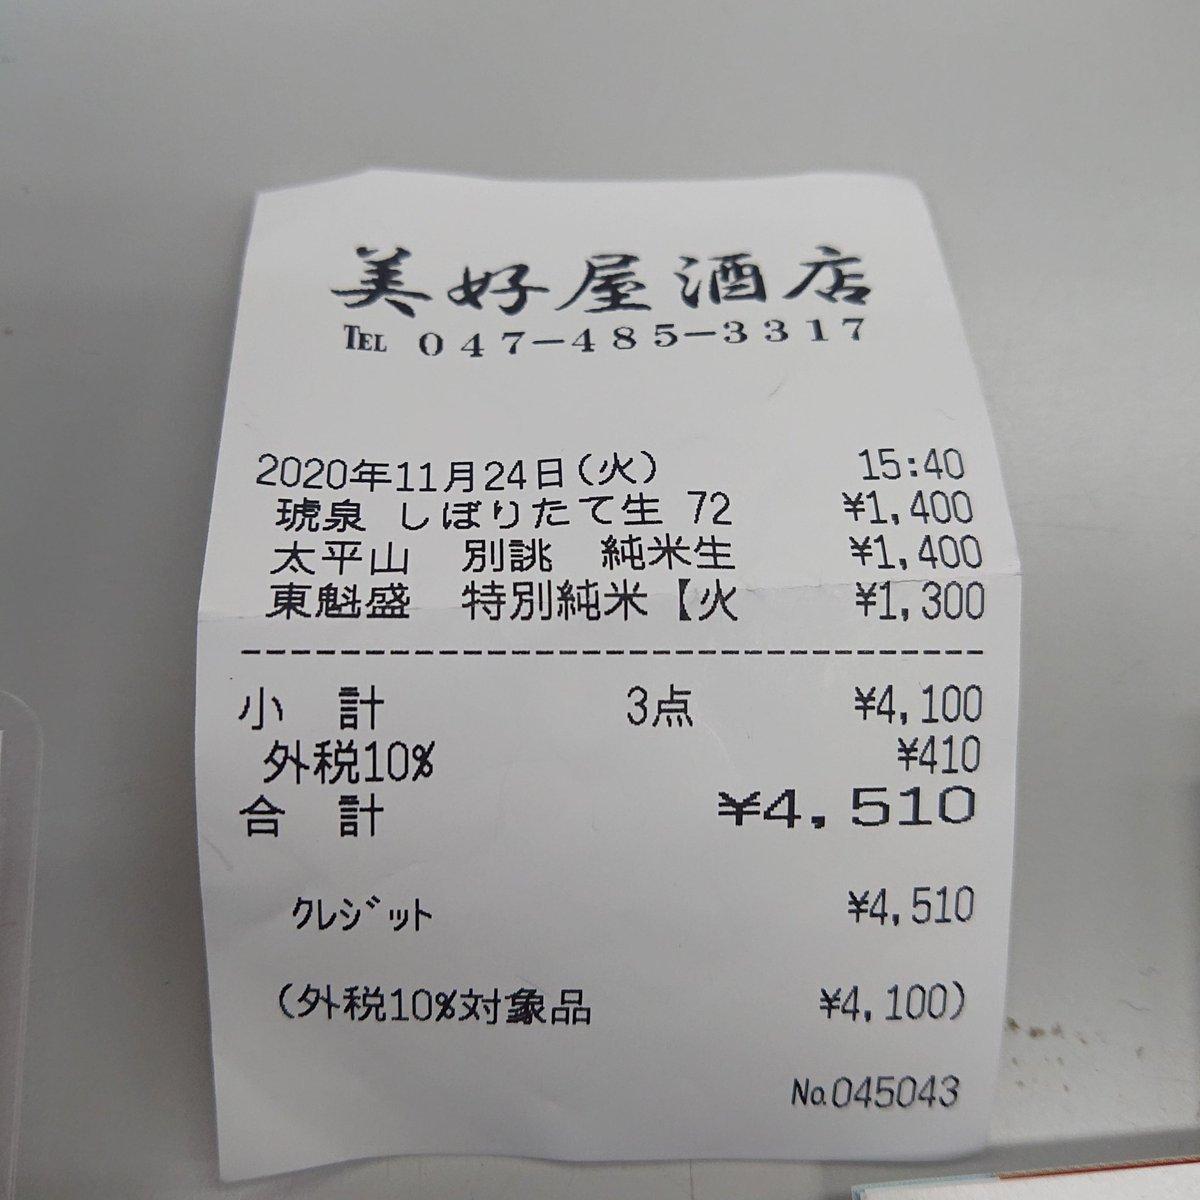 test ツイッターメディア - 日本酒を。20%OFFは大きい。 最近気づいたけどヤフーショッピングとかのセールで日本酒やクラフトビール買ったほうがいいね。かなり安い。 #美好屋酒店 #八千代市 #日本酒 #東魁盛 #太平山 #琥泉 #日本酒 https://t.co/J8OUIftodU https://t.co/7MUlrf18ey